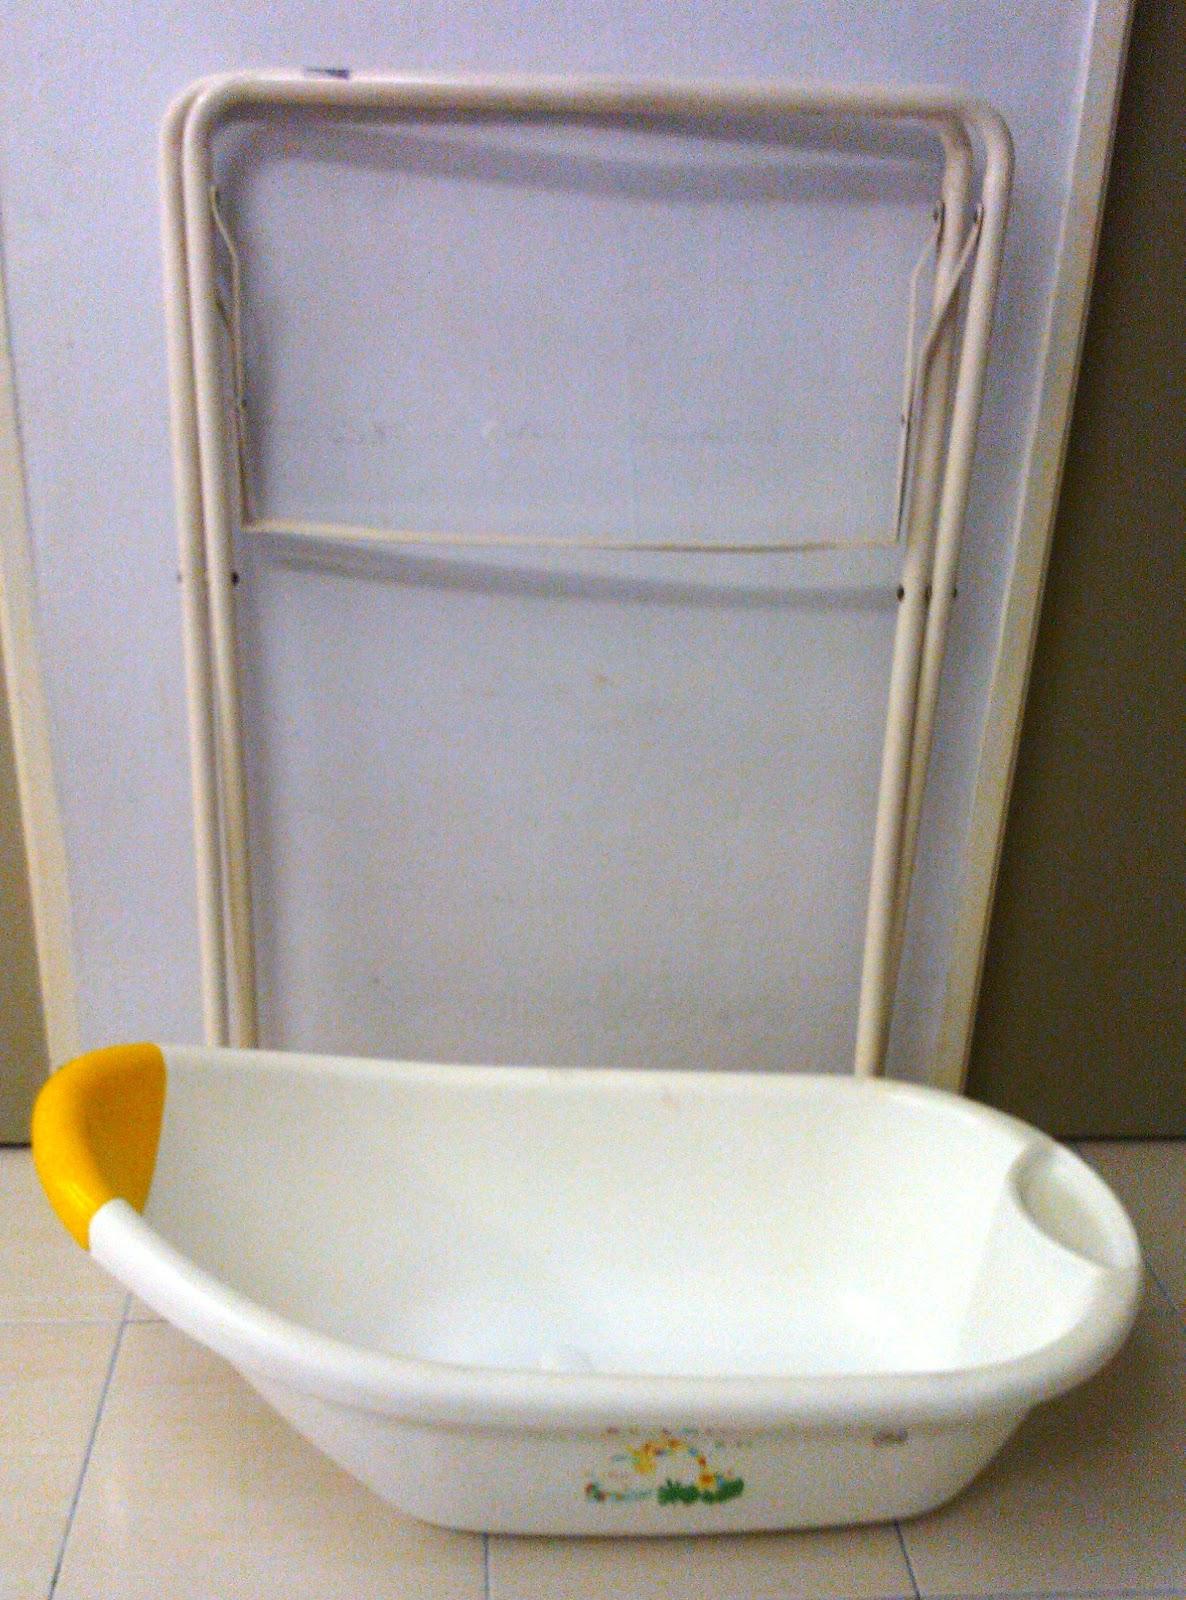 Baby Bath Chair Mothercare Swivel Yeah Jualan Barangan Bayi Dan Kanak Preloved